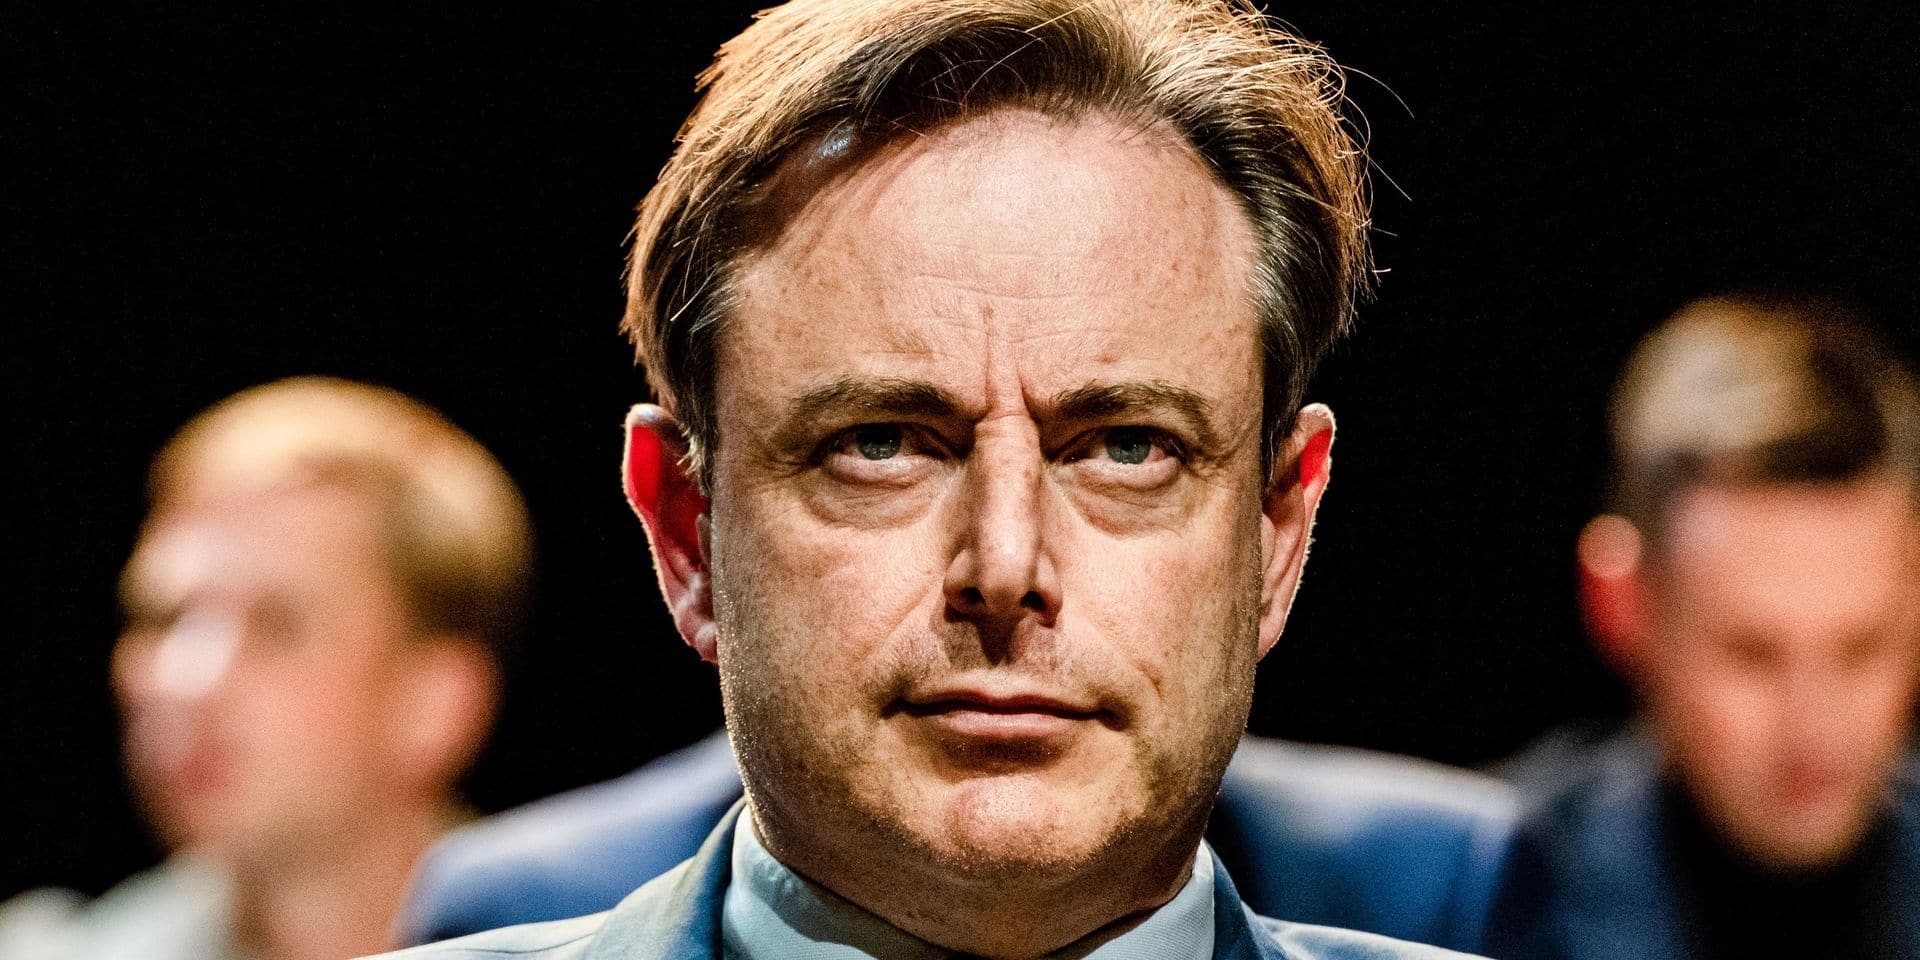 Édito: le win-win de Bart De Wever